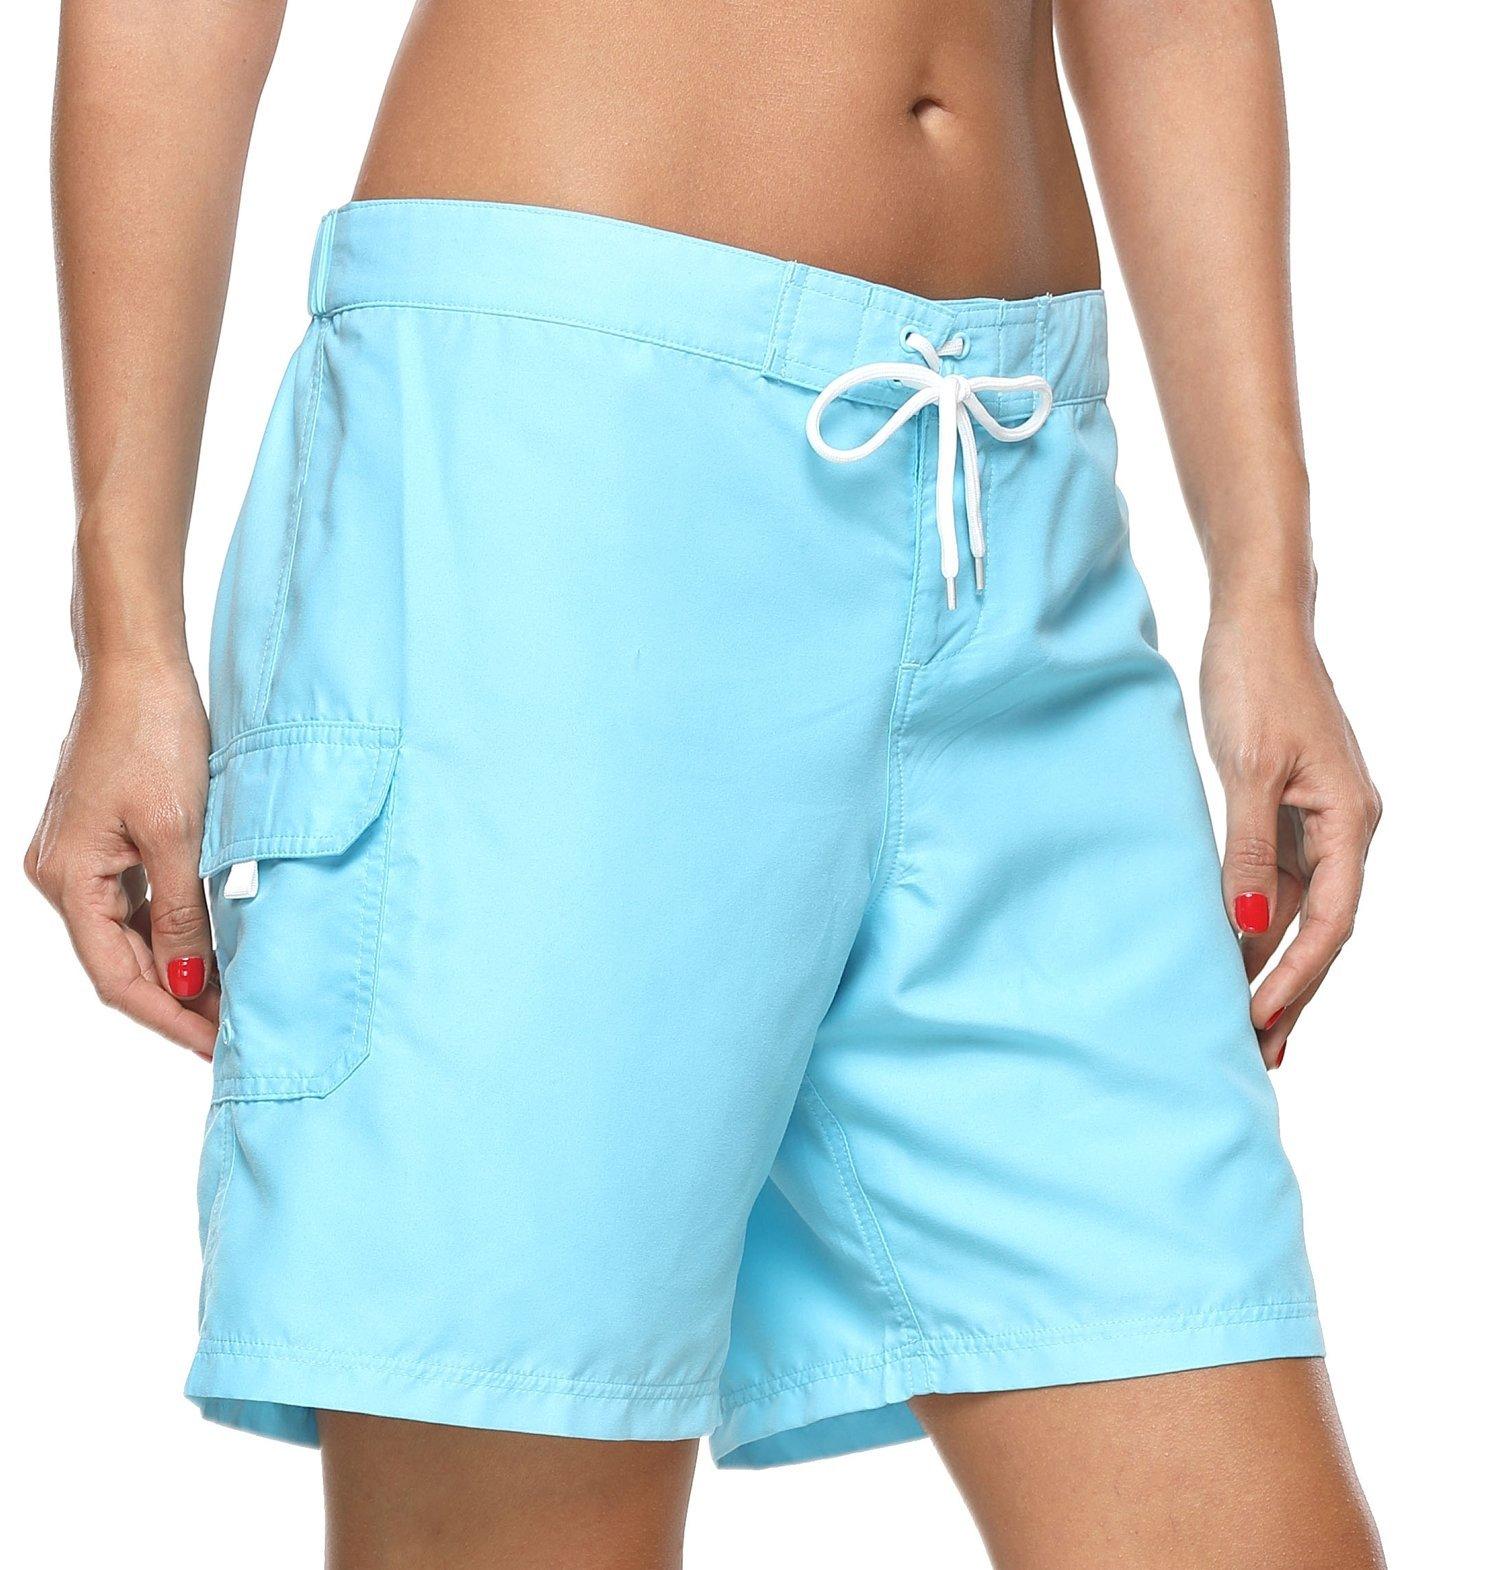 ATTRACO Women's Long Board Short Side Pocket Drawstring Swimwear Shorts Blue Large by ATTRACO (Image #3)